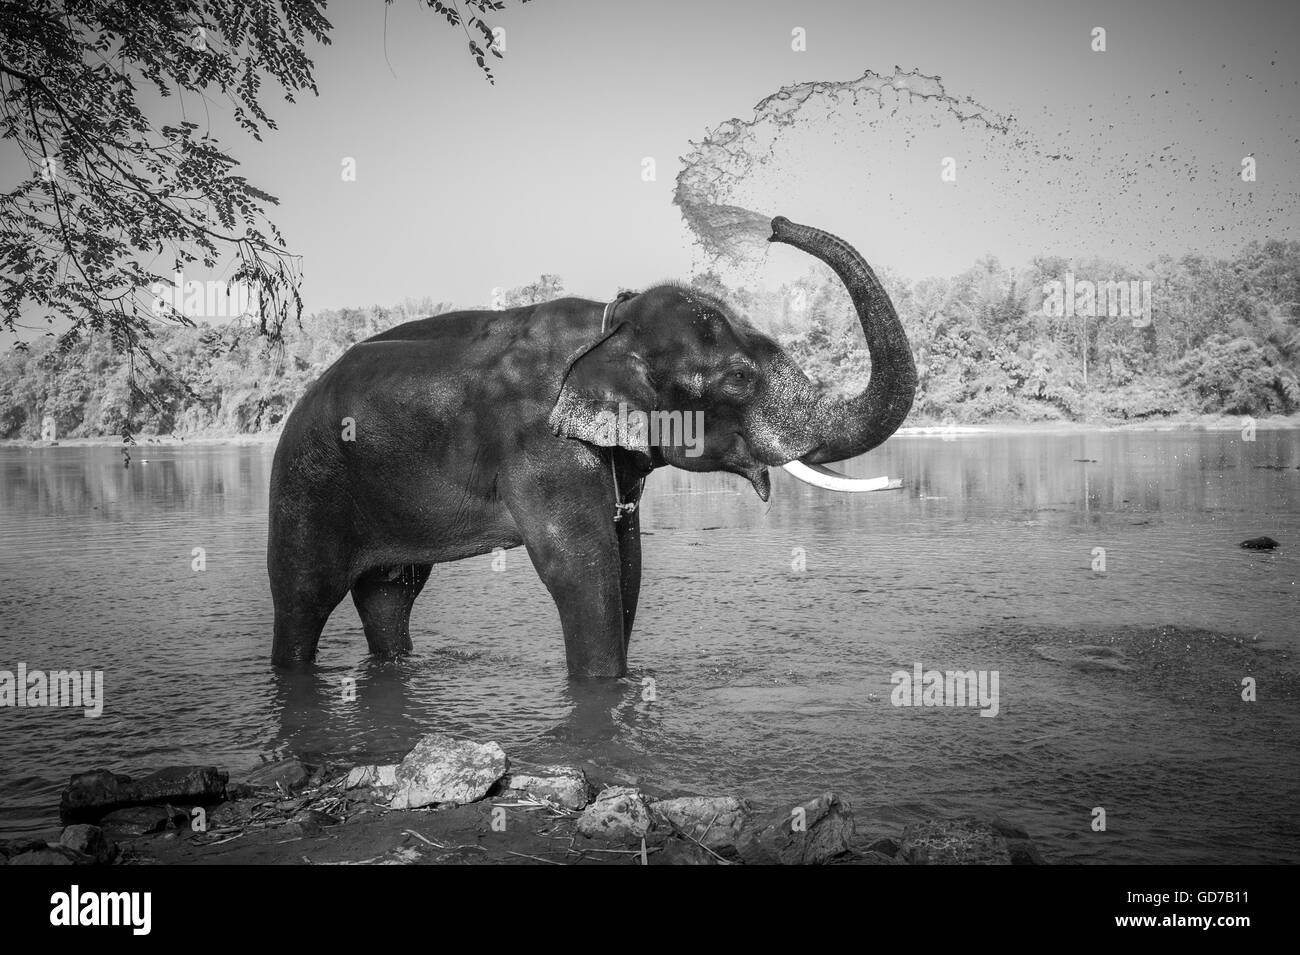 Schwarz / weiß Bild Elefanten Baden, Kerala, Indien Stockbild